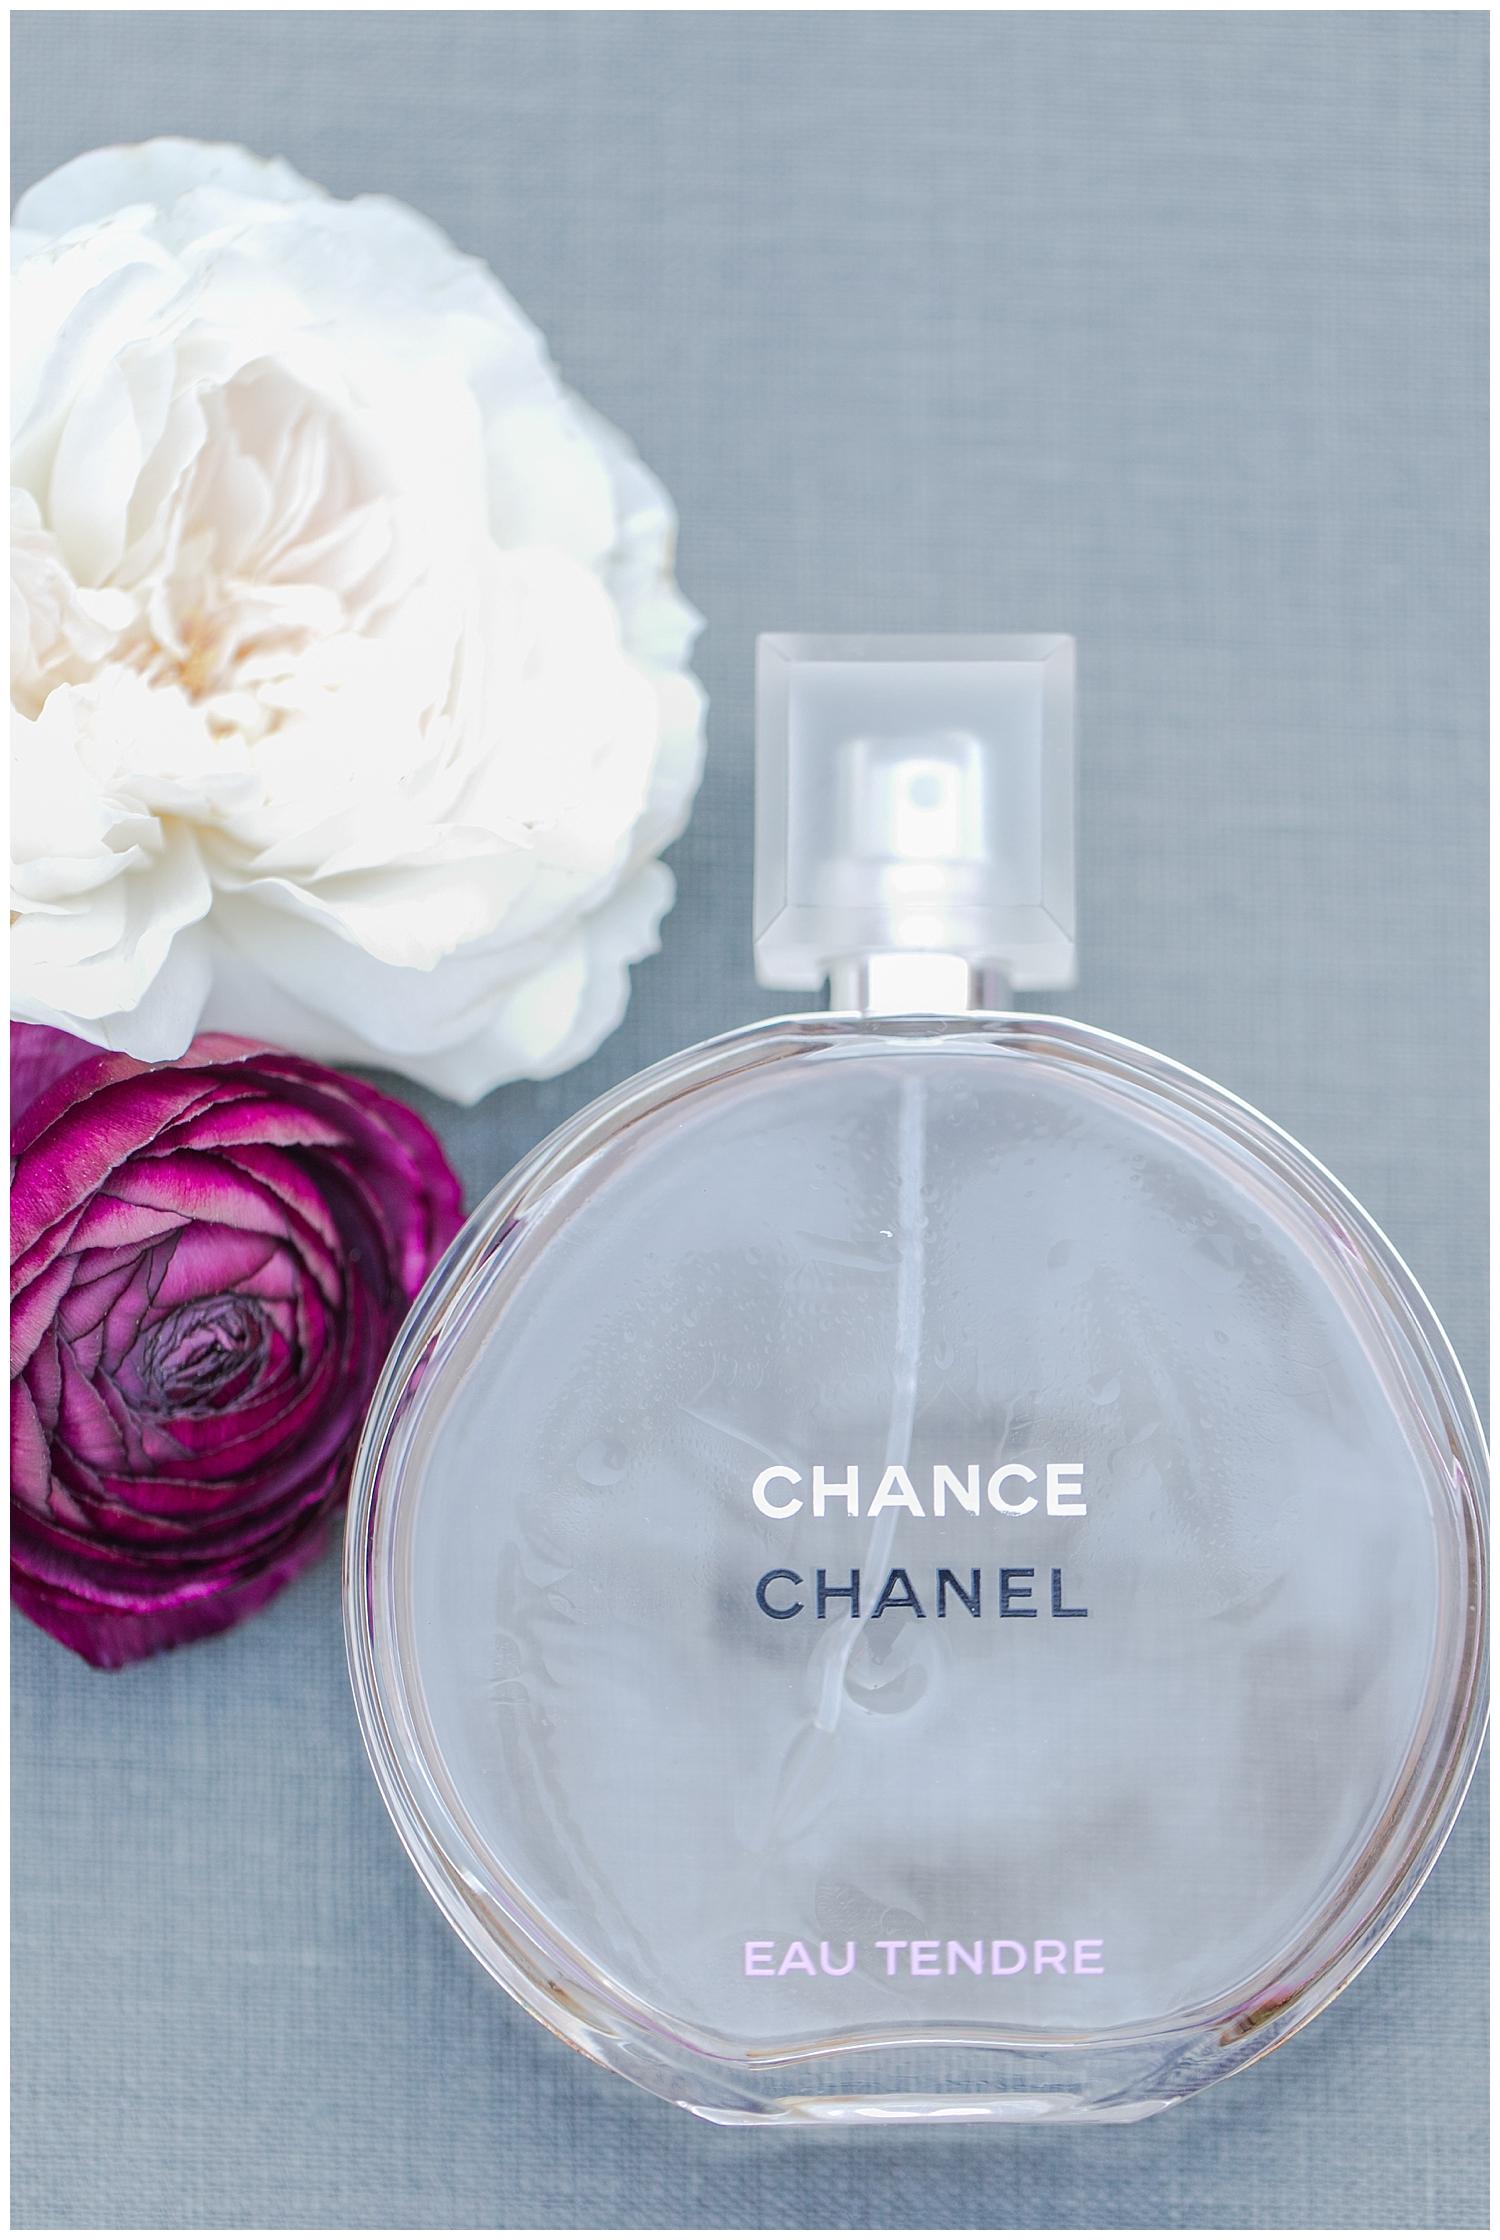 Borrowing this lovely bottle of perfume was Kori's something borrowed.